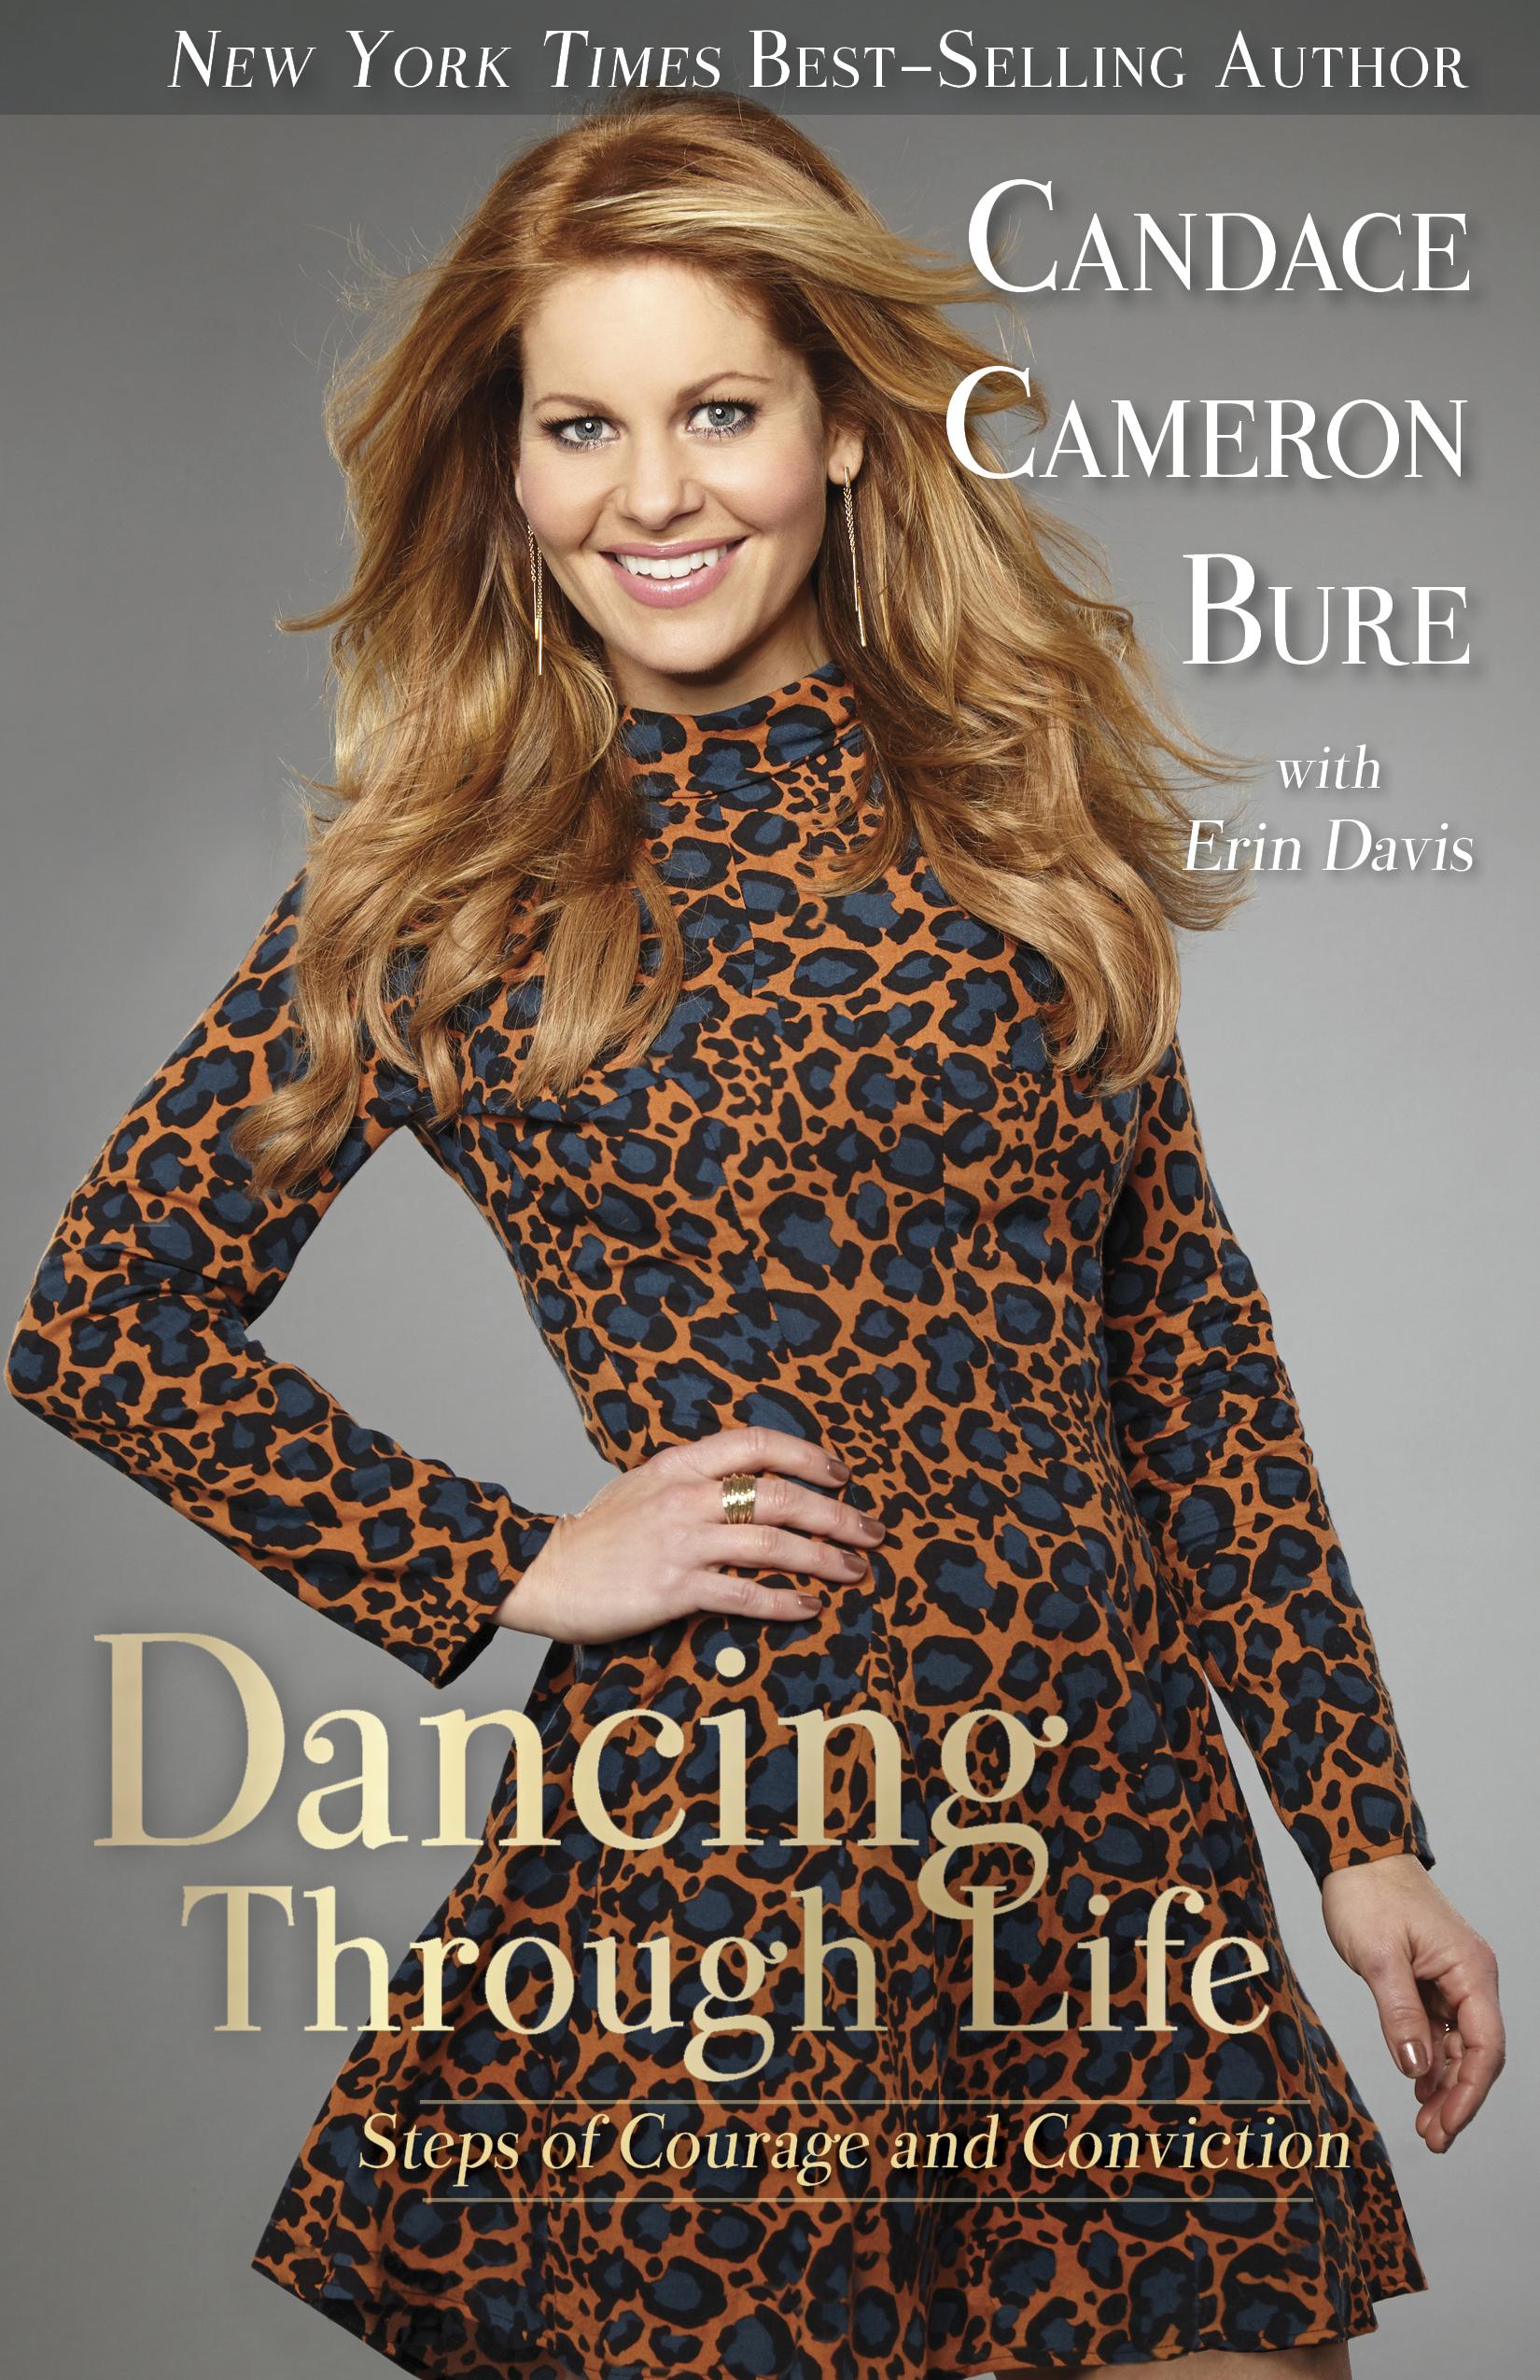 DancingThroughLife_CVR  .jpg